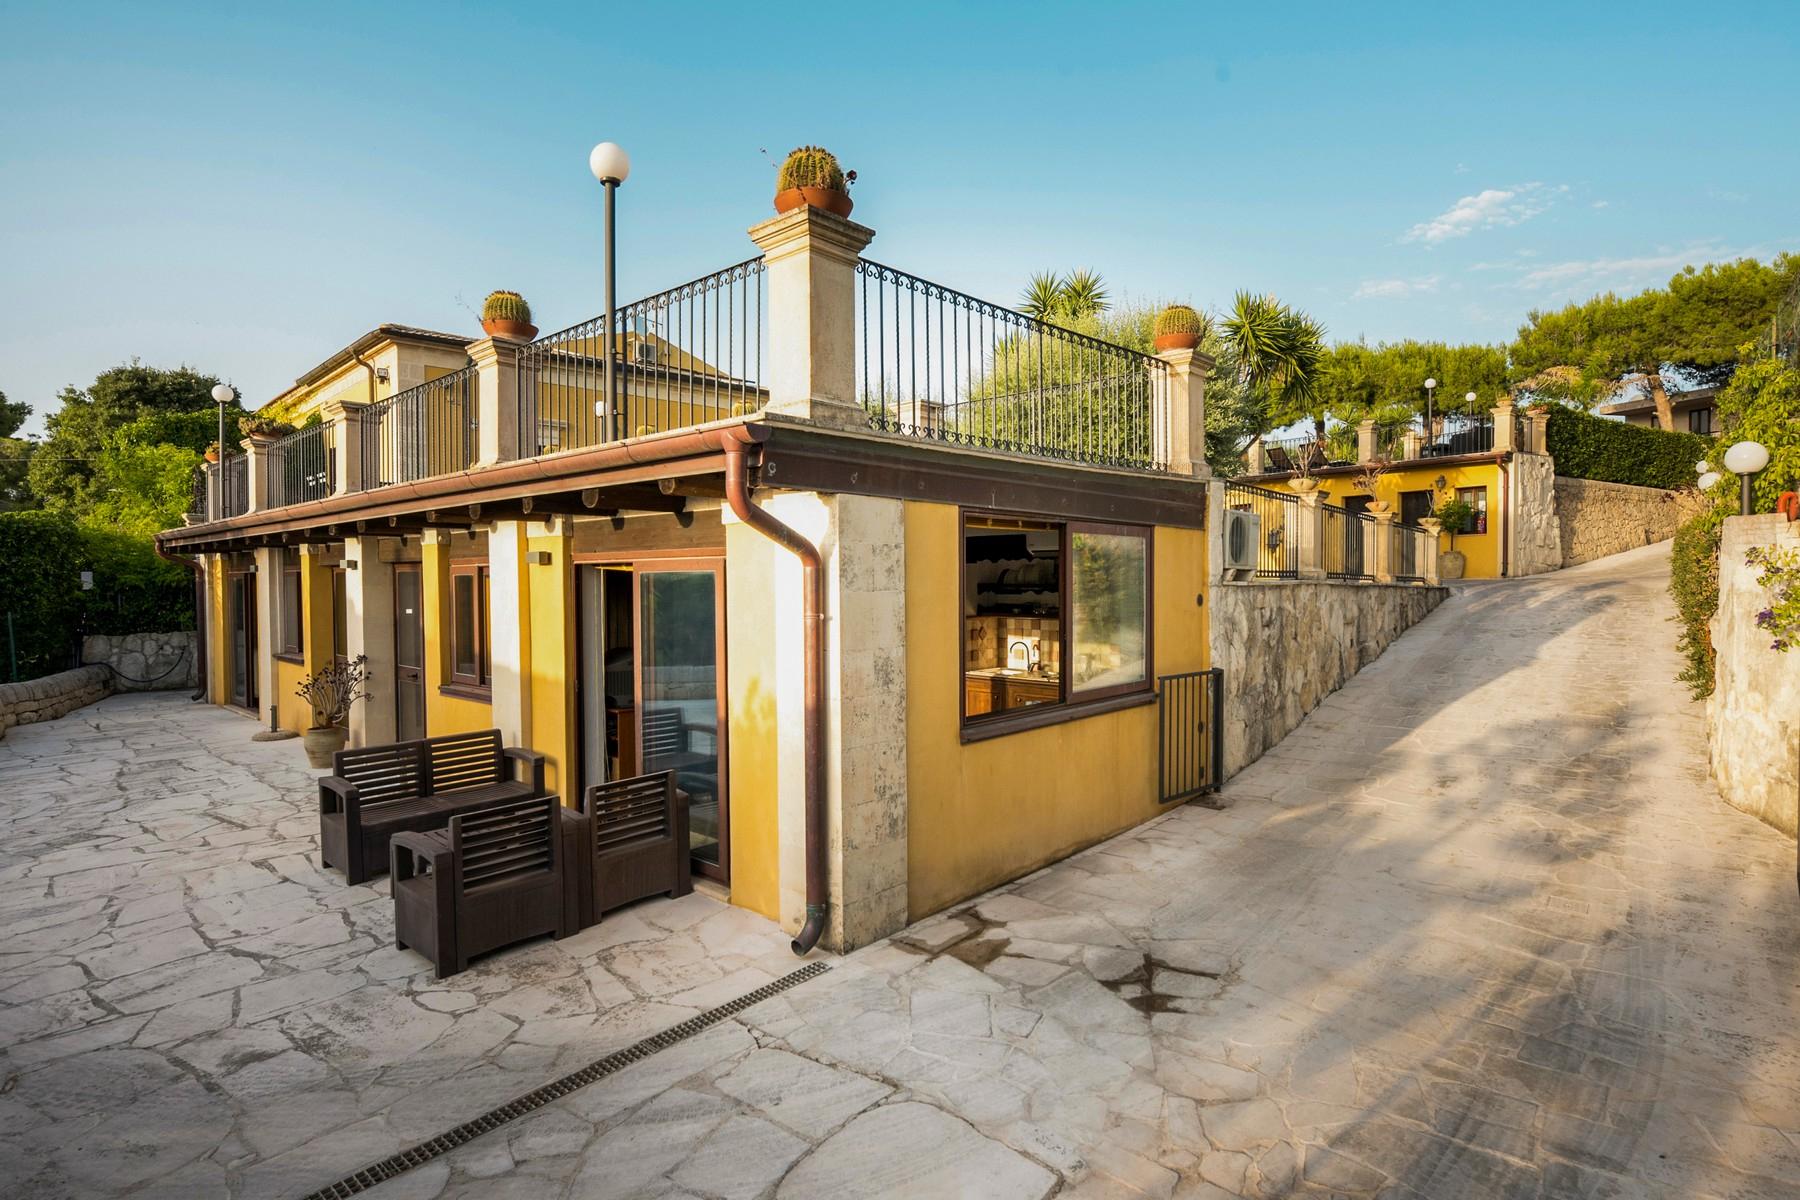 Casa indipendente in Vendita a Noto: 5 locali, 300 mq - Foto 26